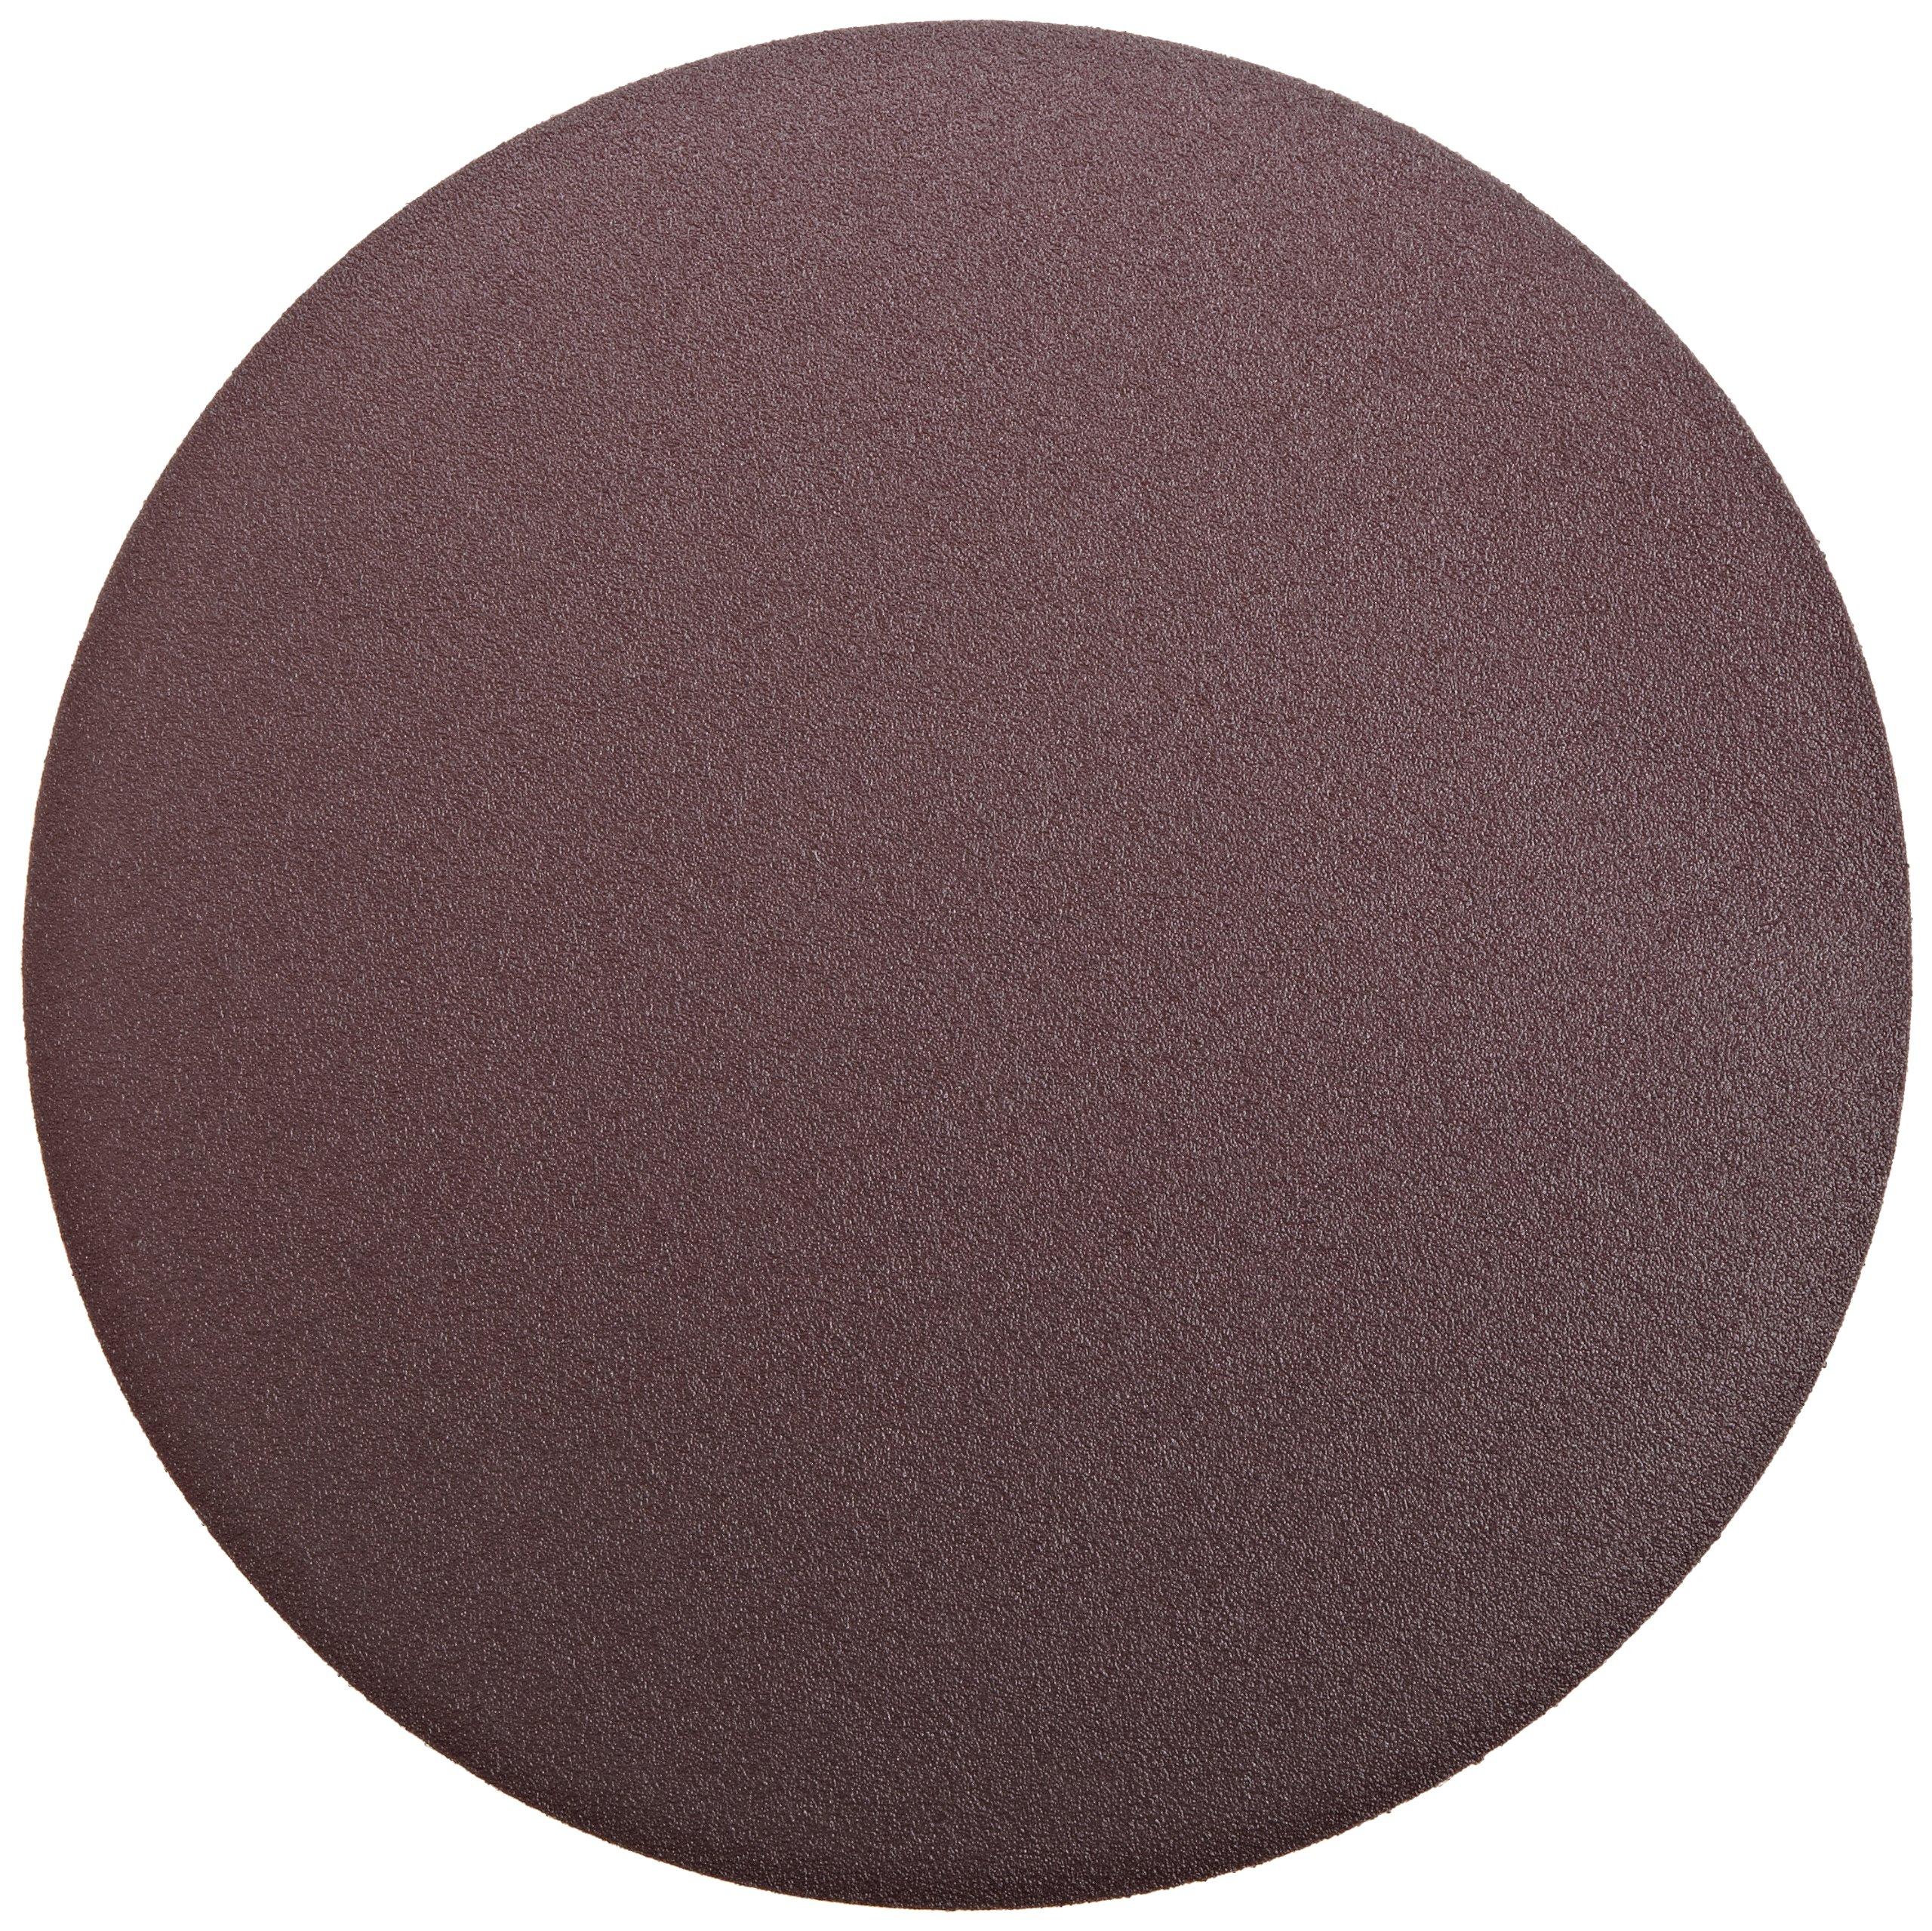 3M PSA Cloth Disc 348D, X Weight Cloth, PSA Attachment, Aluminum Oxide, 12'' Diameter, 80 Grit, Brown (Pack of 10) by Cubitron